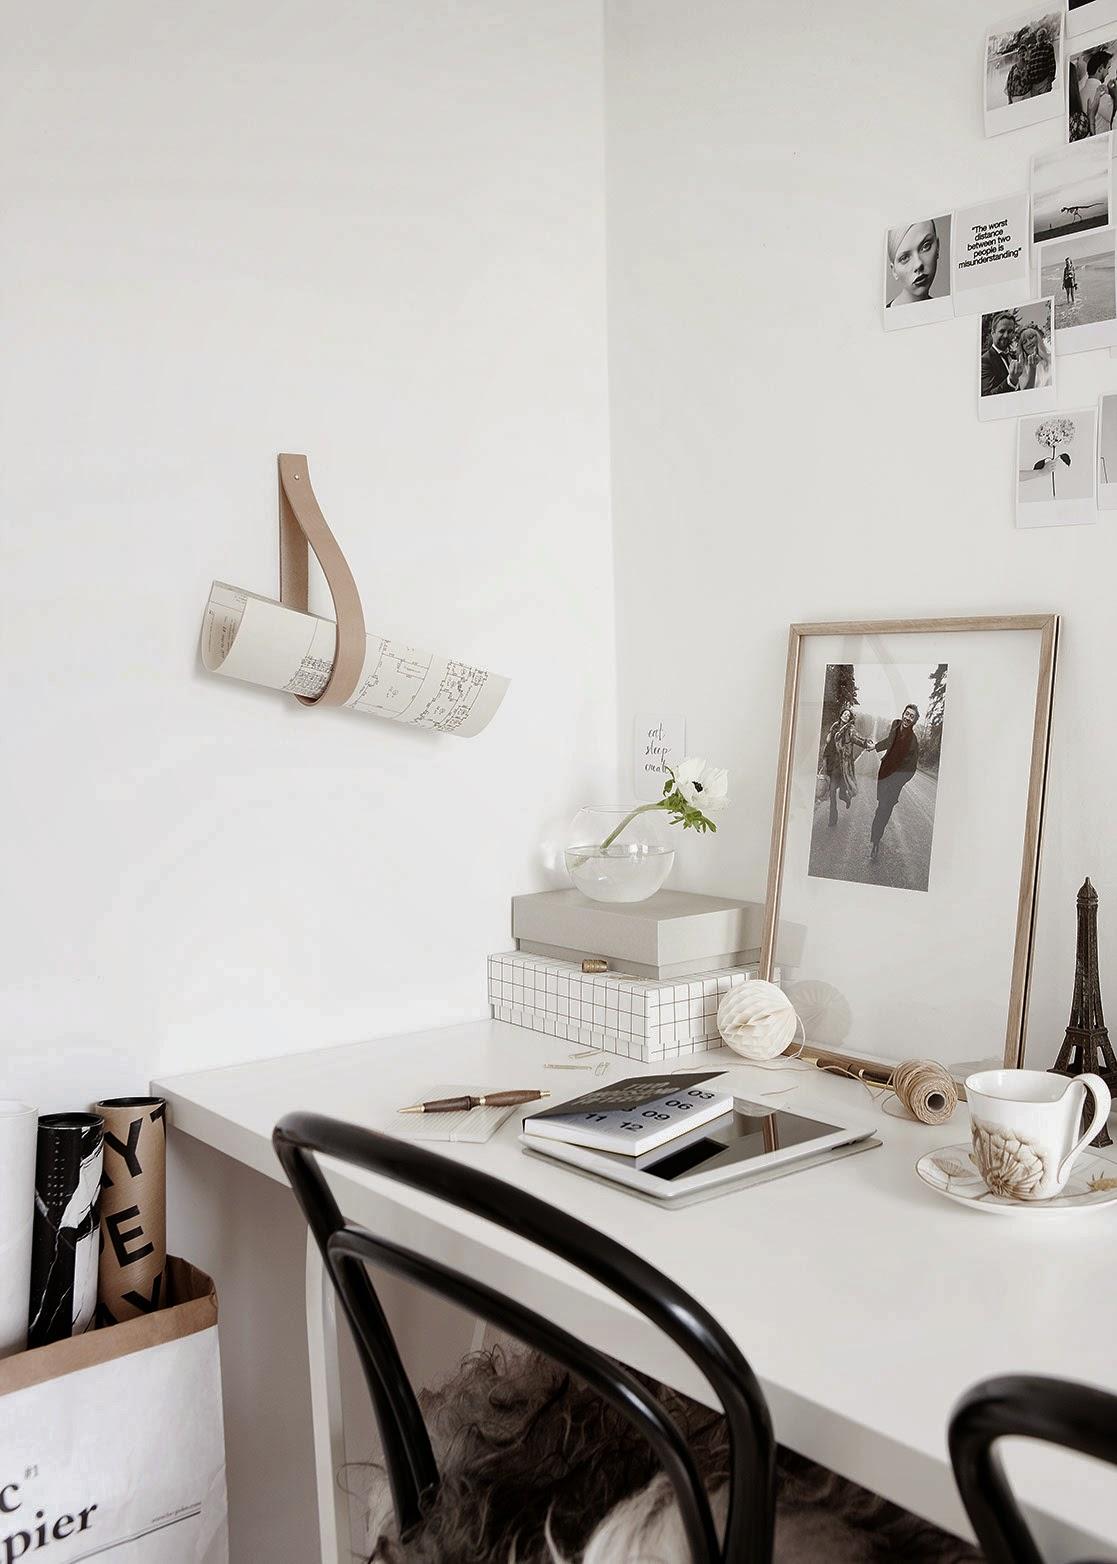 Our Old Apartment in Bolig Magasinet, Scandinavian interior design, via Scandinavian Love Song